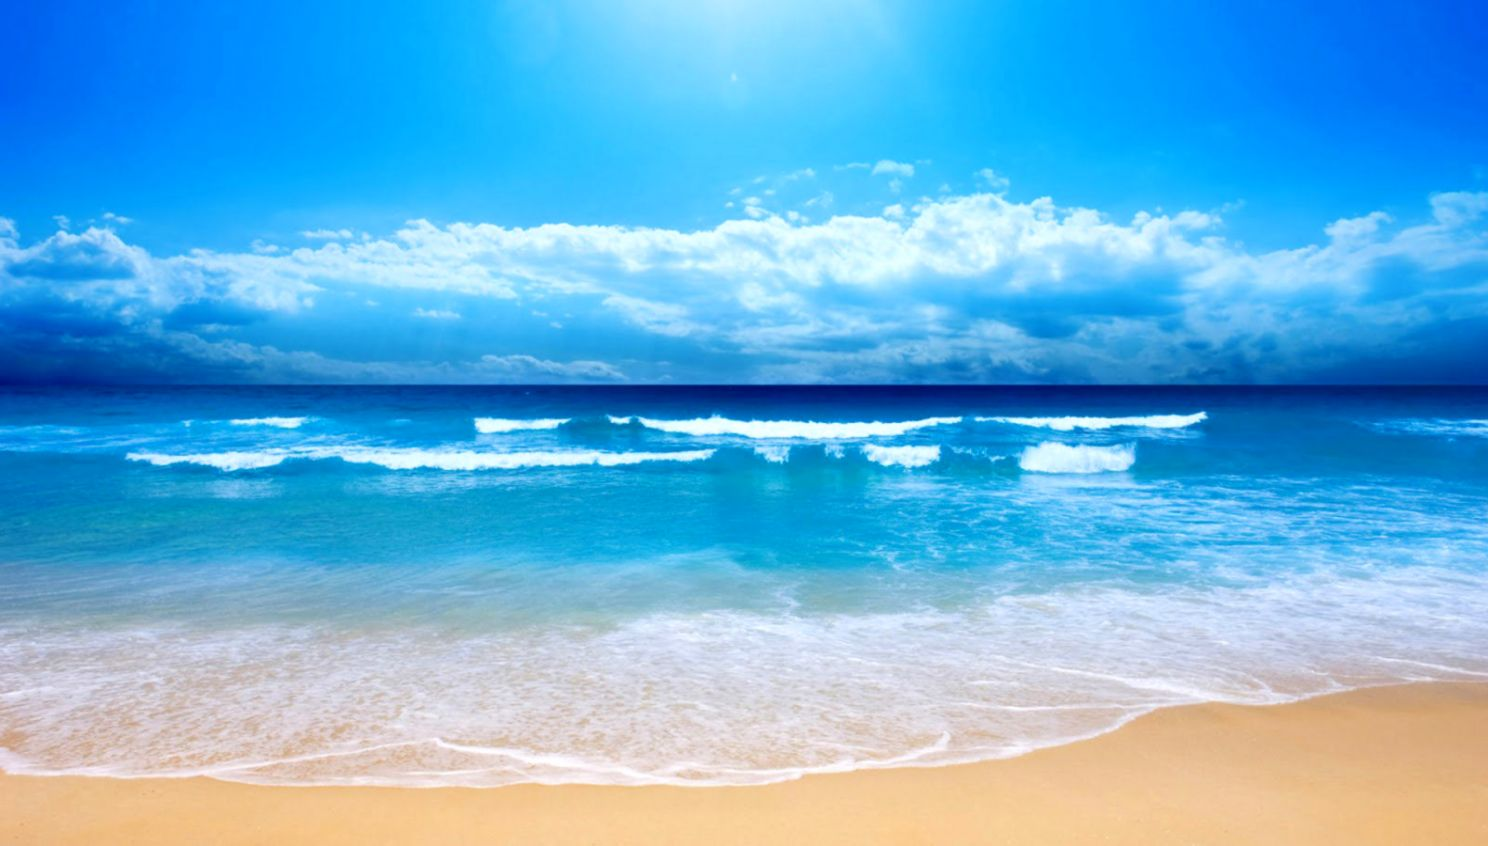 Desktop Background Beach Decor di Design 1488x846